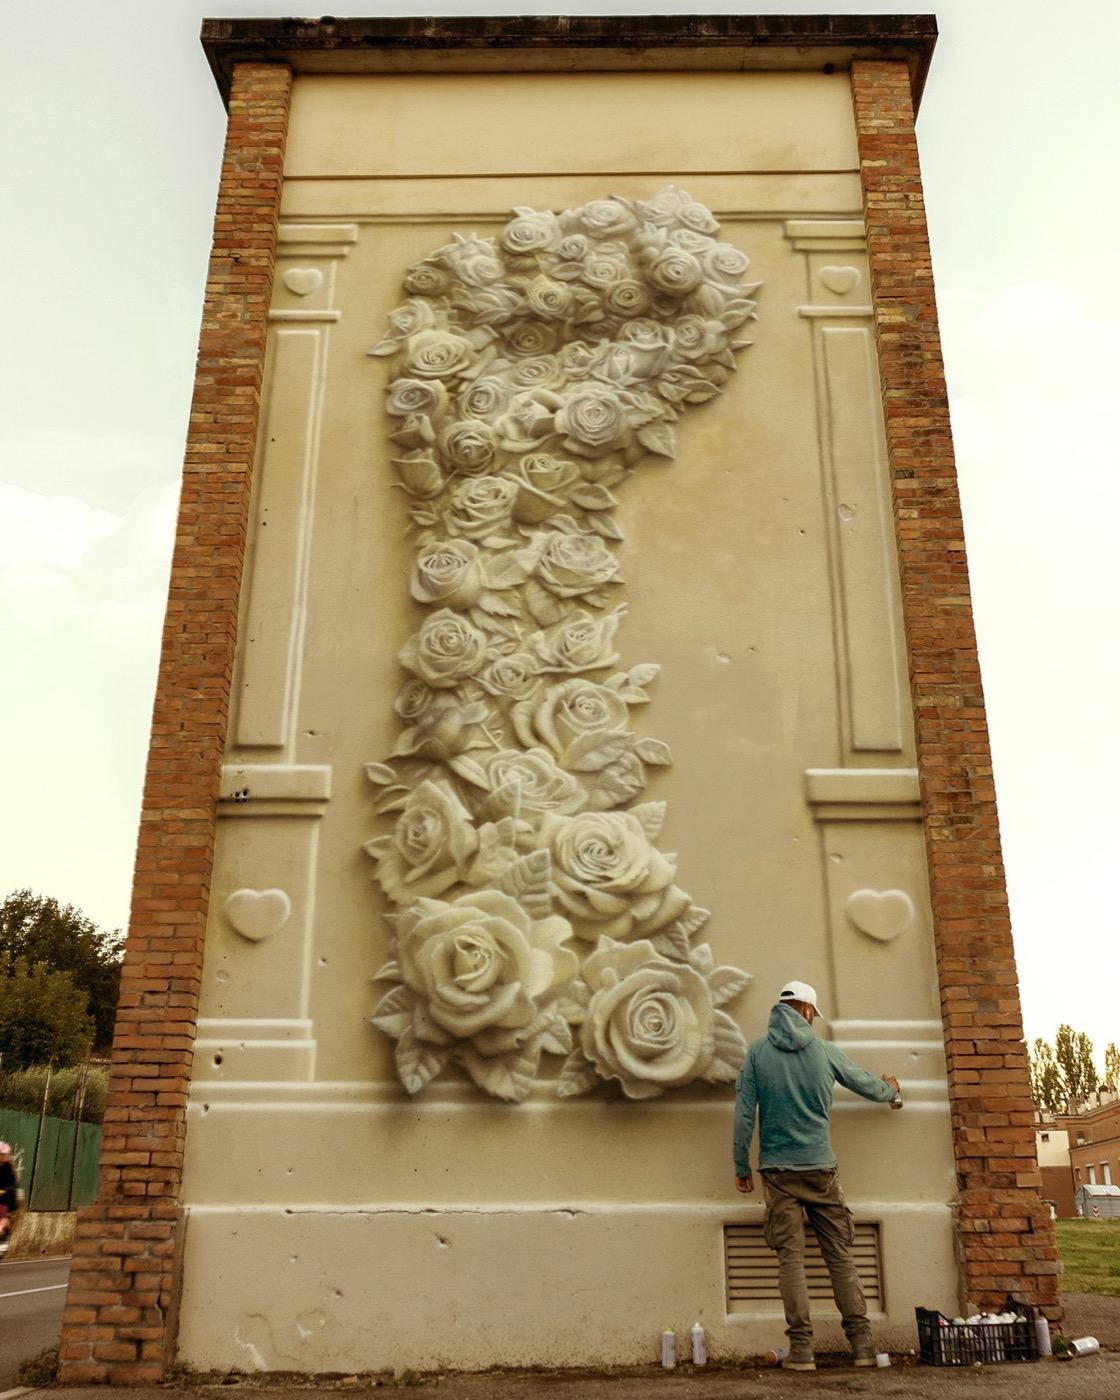 Eron, Tower to the People, Romagna, Rimini, 2018